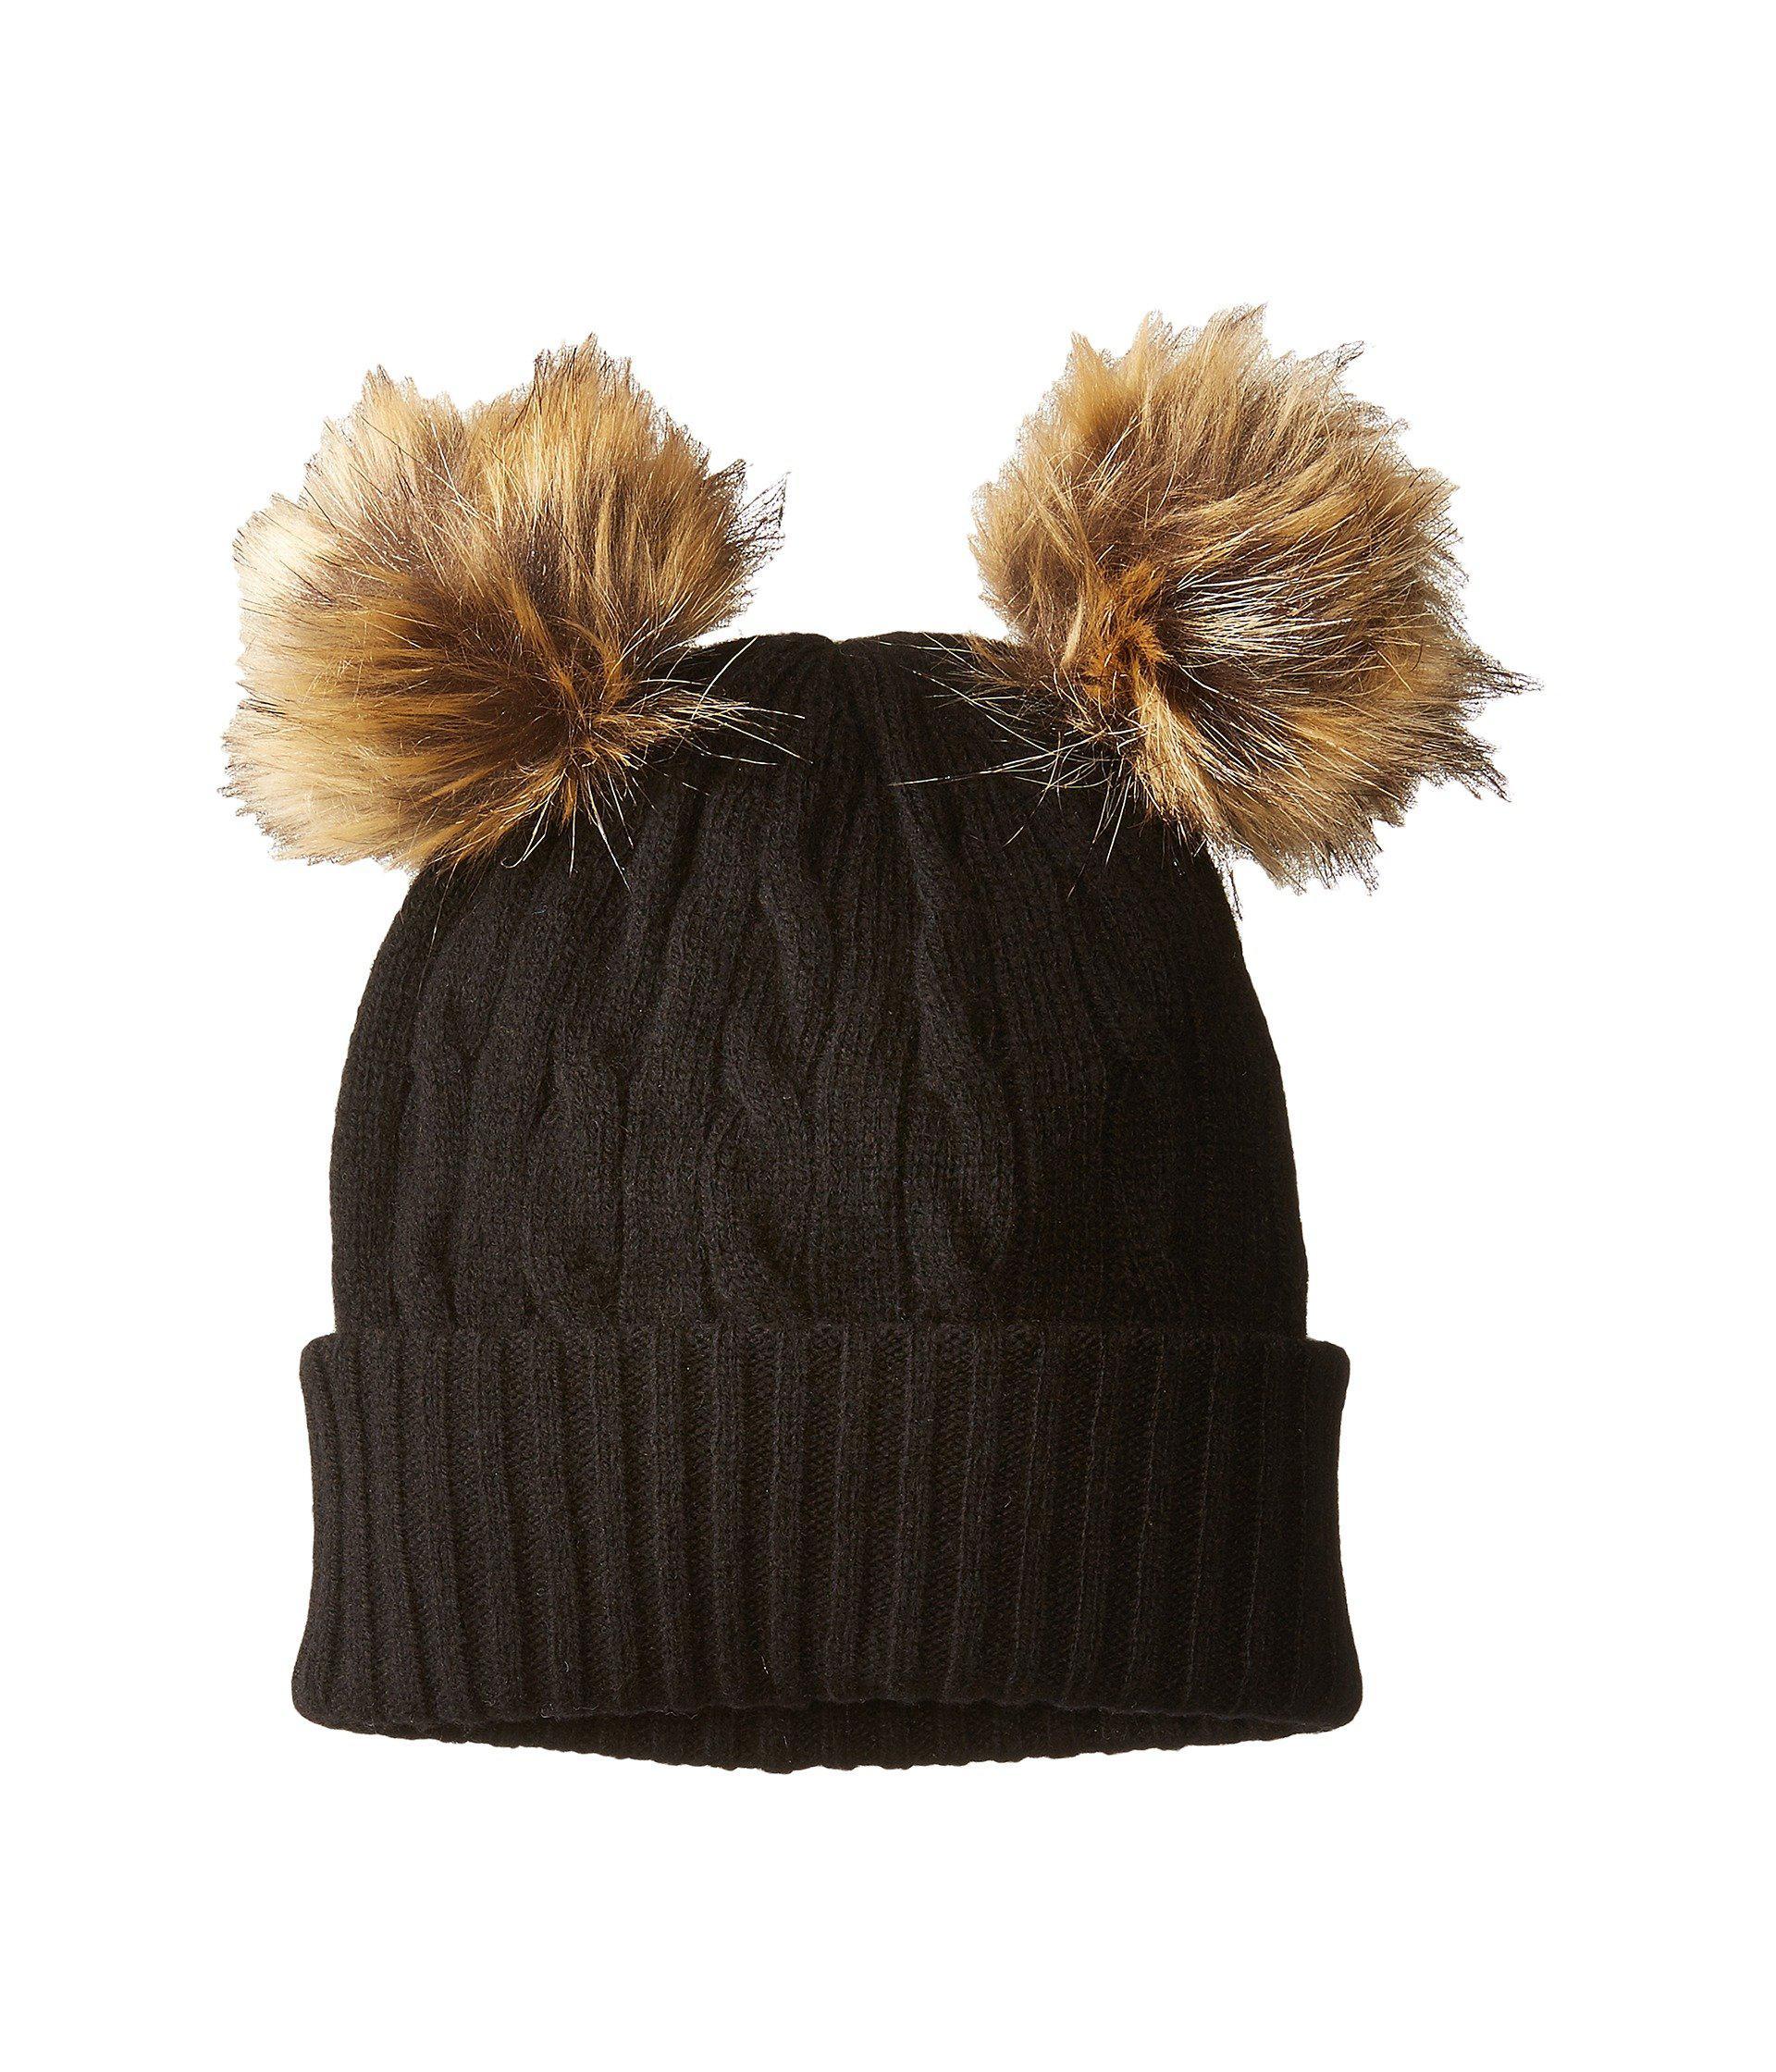 dda315fd7c5b75 Polo Ralph Lauren Double Pom Cashmere Blend Hat in Black - Lyst